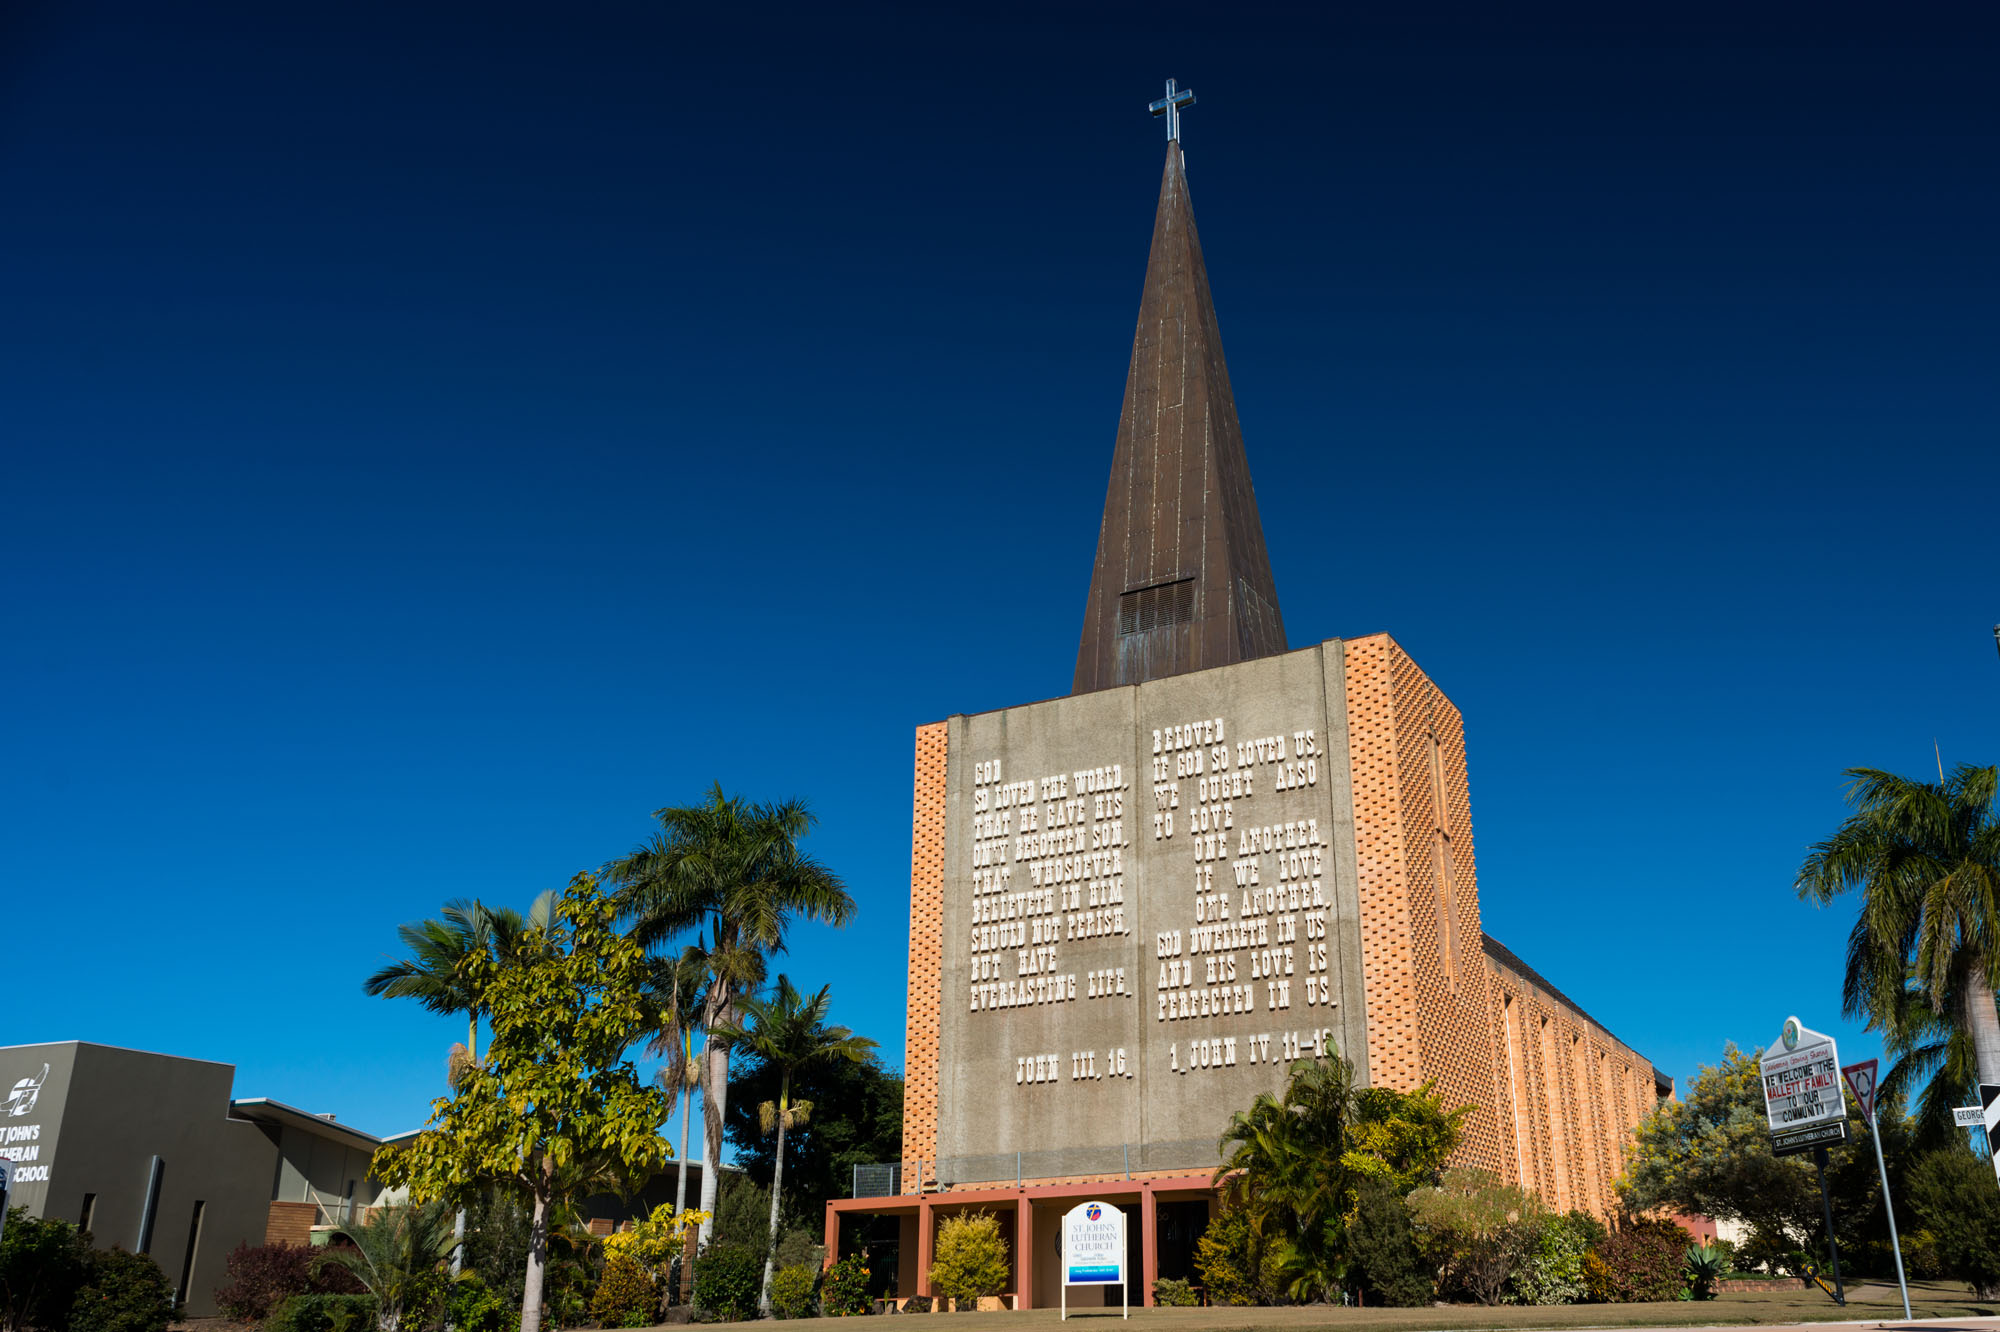 St John's Lutheran Church, Bundaberg, Queesland